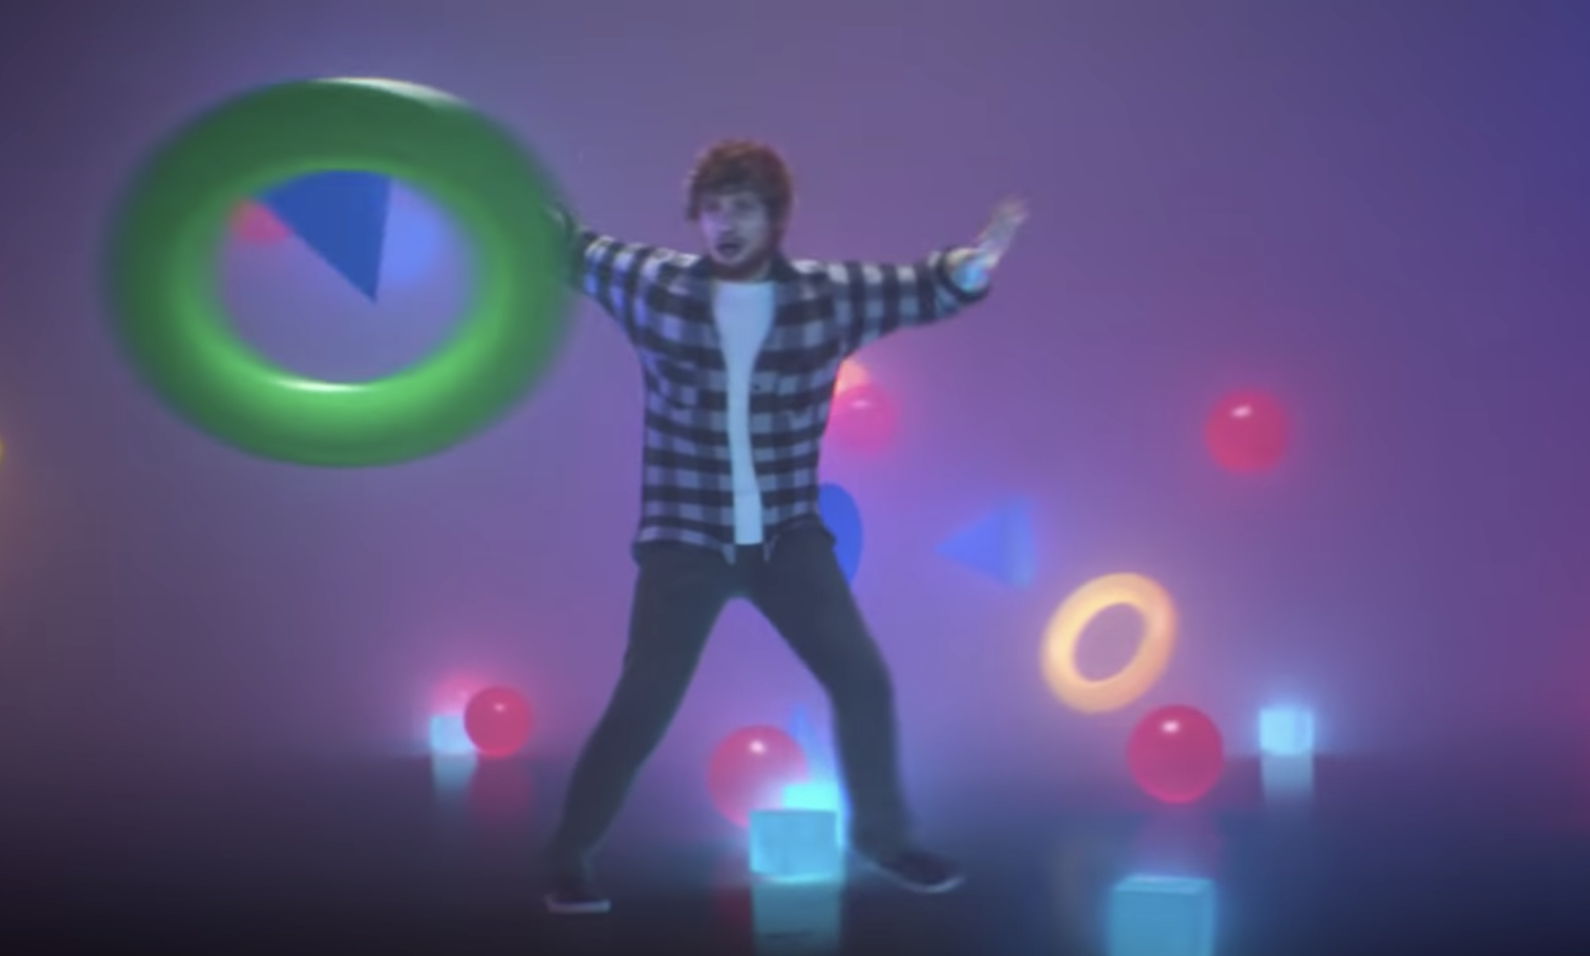 Ed Sheeran feat. Chance The Rapper & PnB Rock – Cross Me (Video)